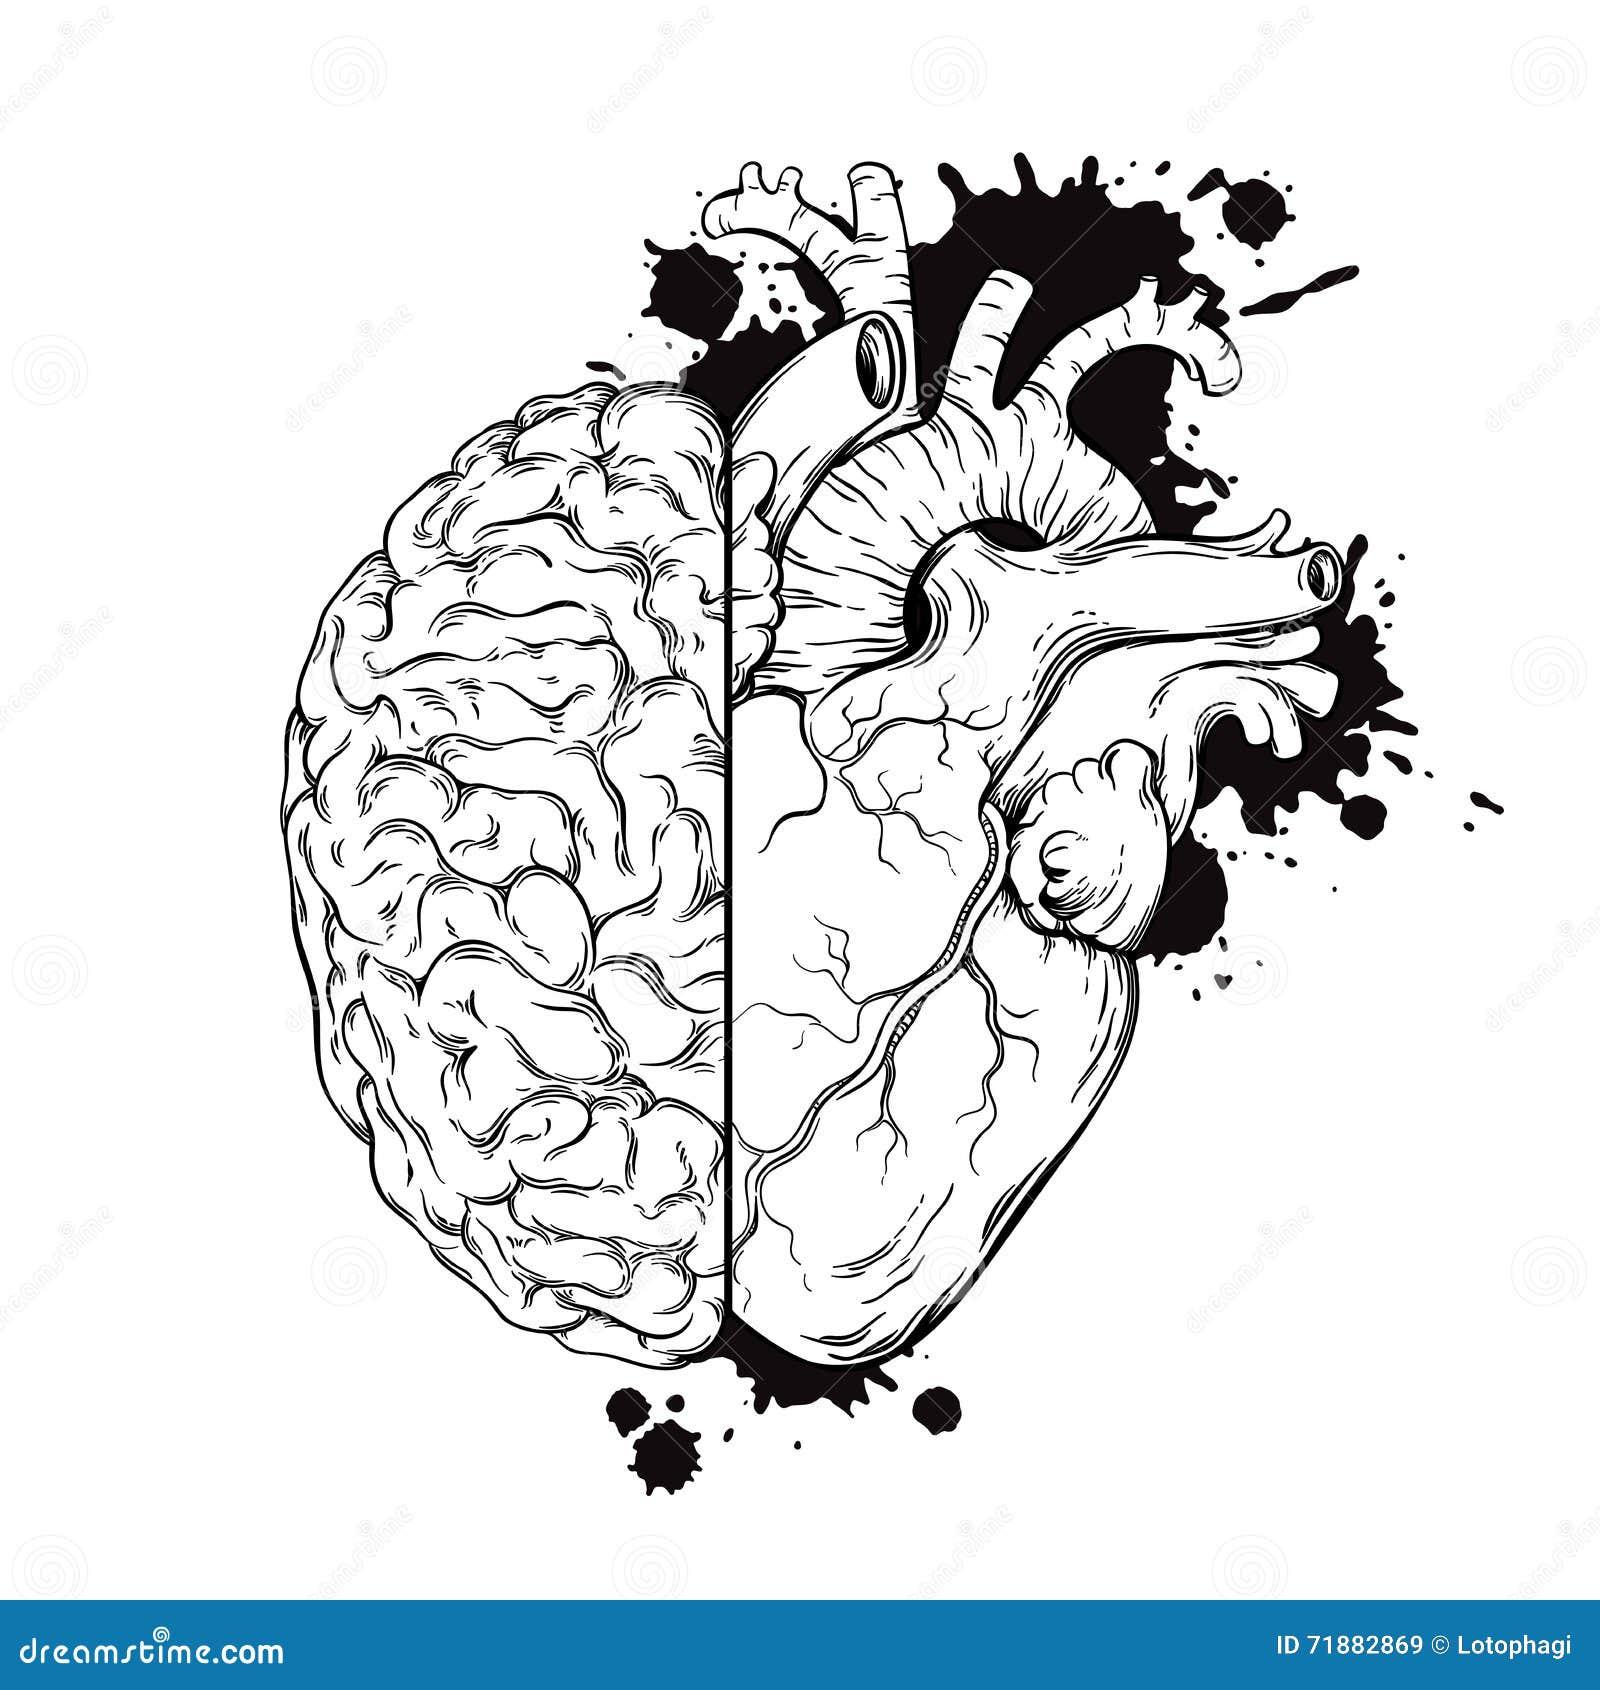 Human Brain Art Designs